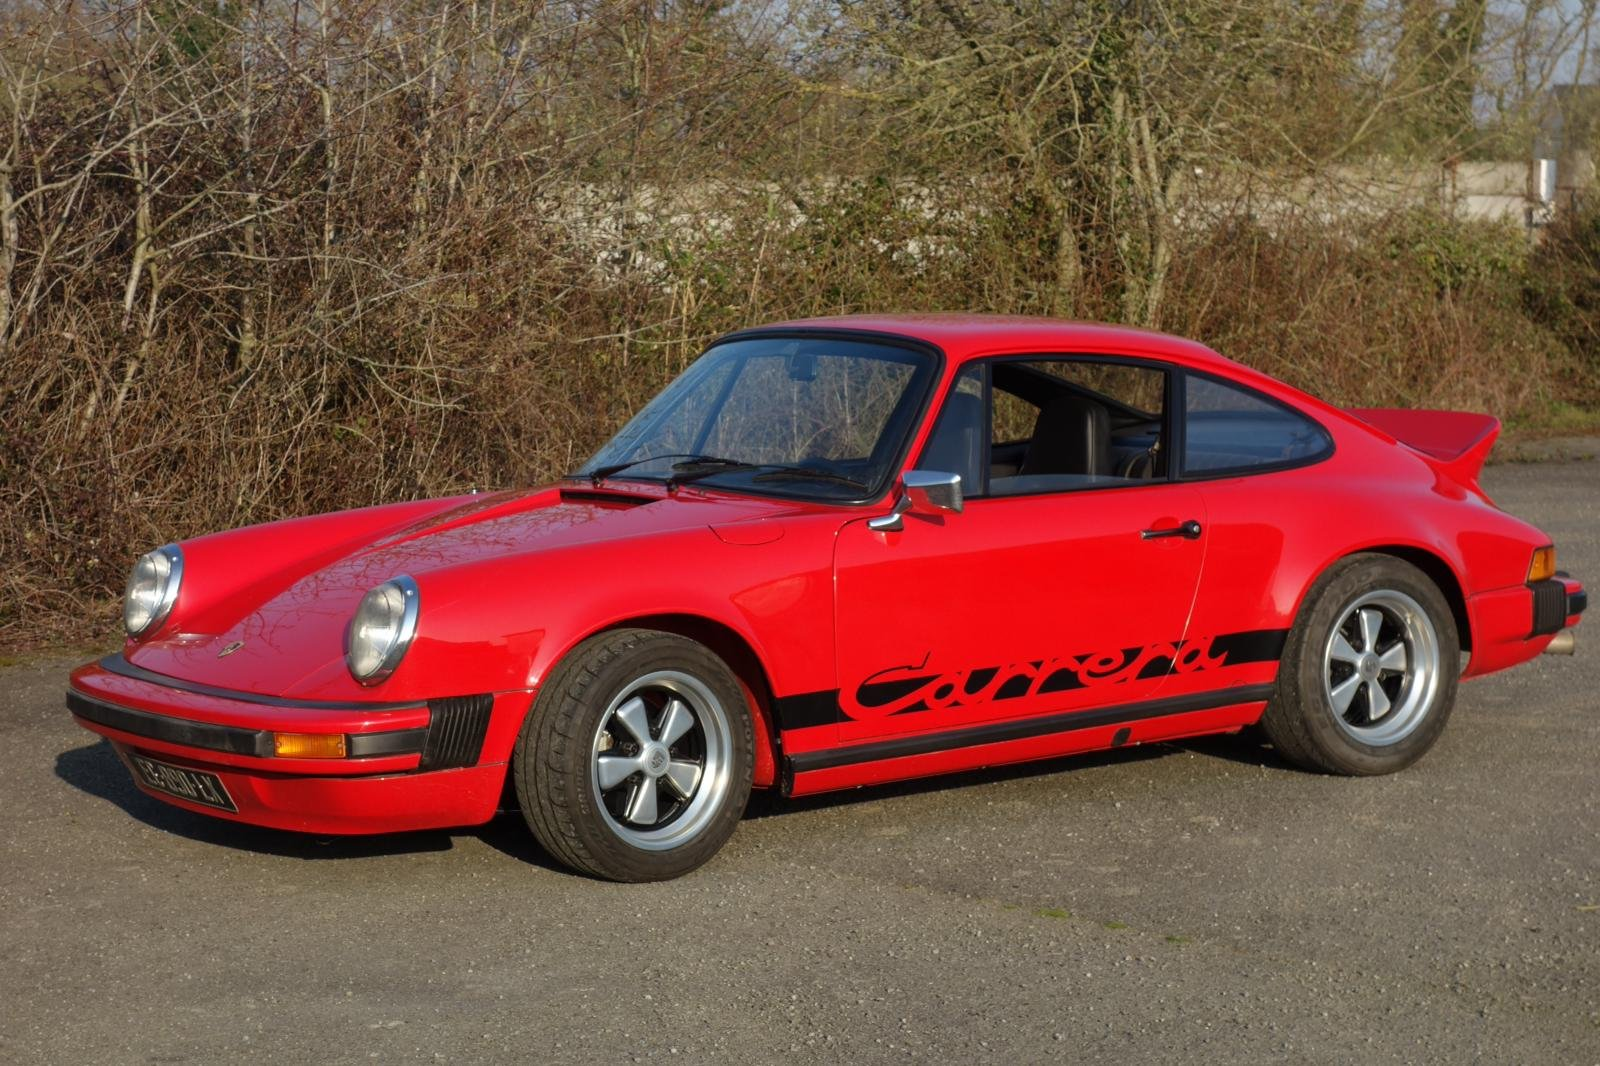 1975 Beautiful 911 carrera 2.7l MFI For Sale (picture 1 of 5)